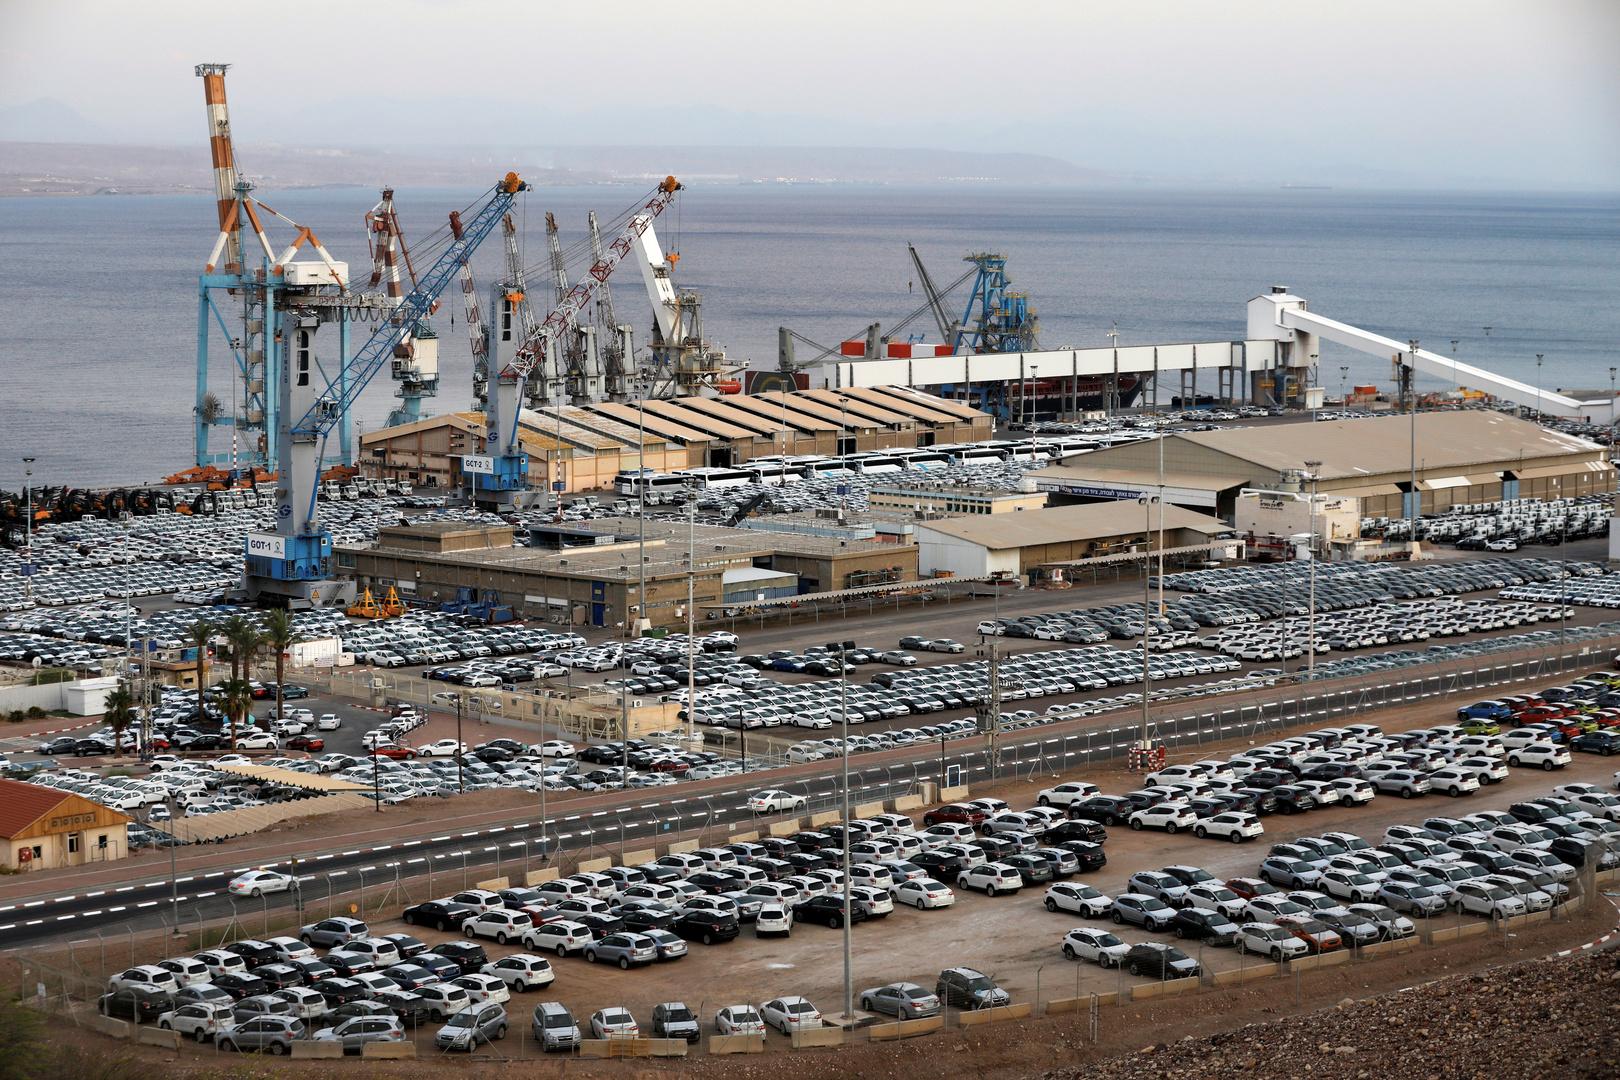 خط شحن بحري مباشر بين دبي وإيلات